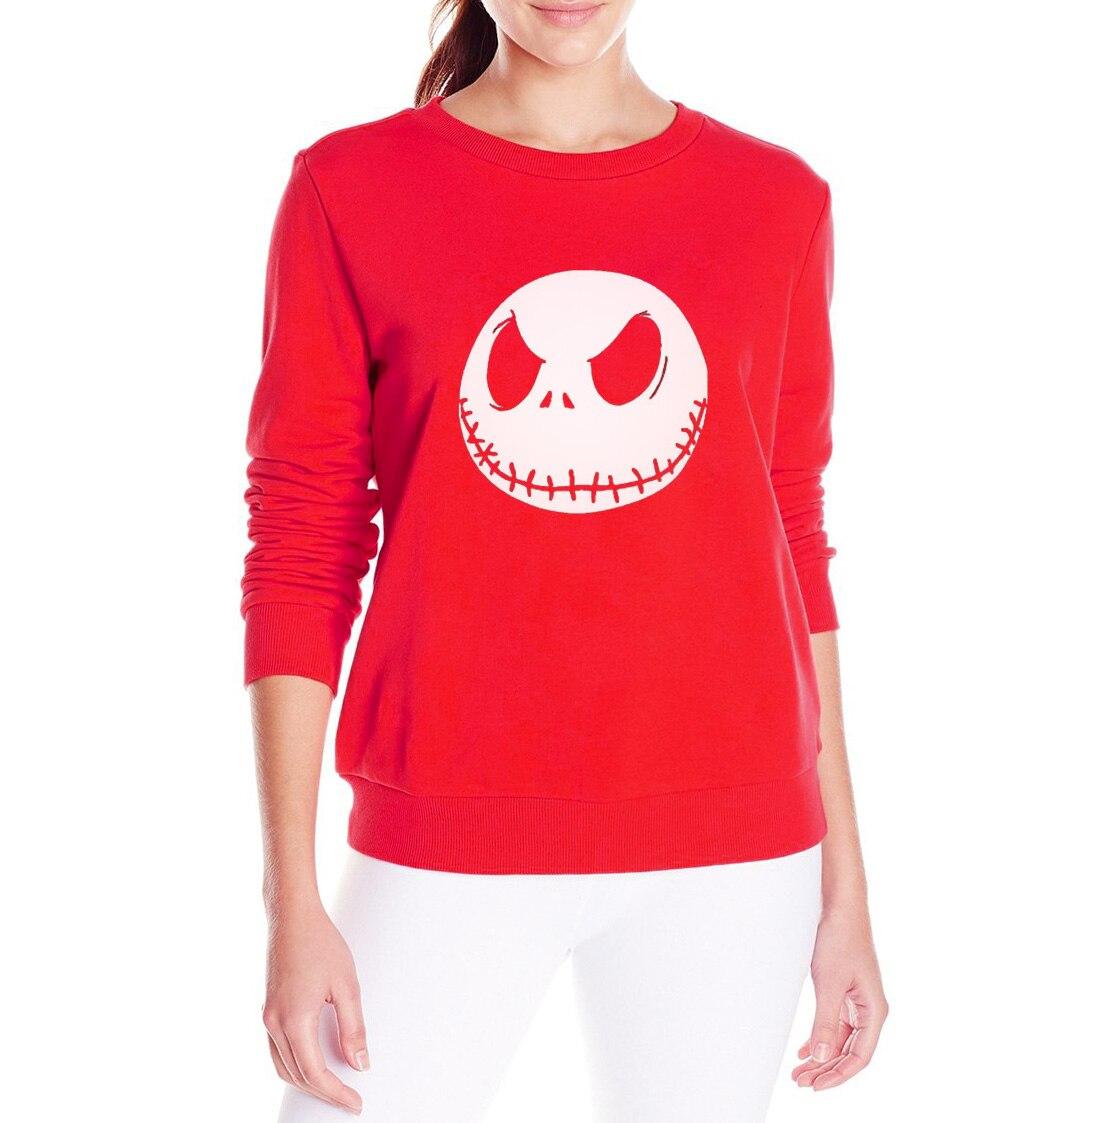 Jack Skellington print women funny sweatshirt loose-fitting hoodies cotton pullovers long sleeve fashion tracksuit for ladies